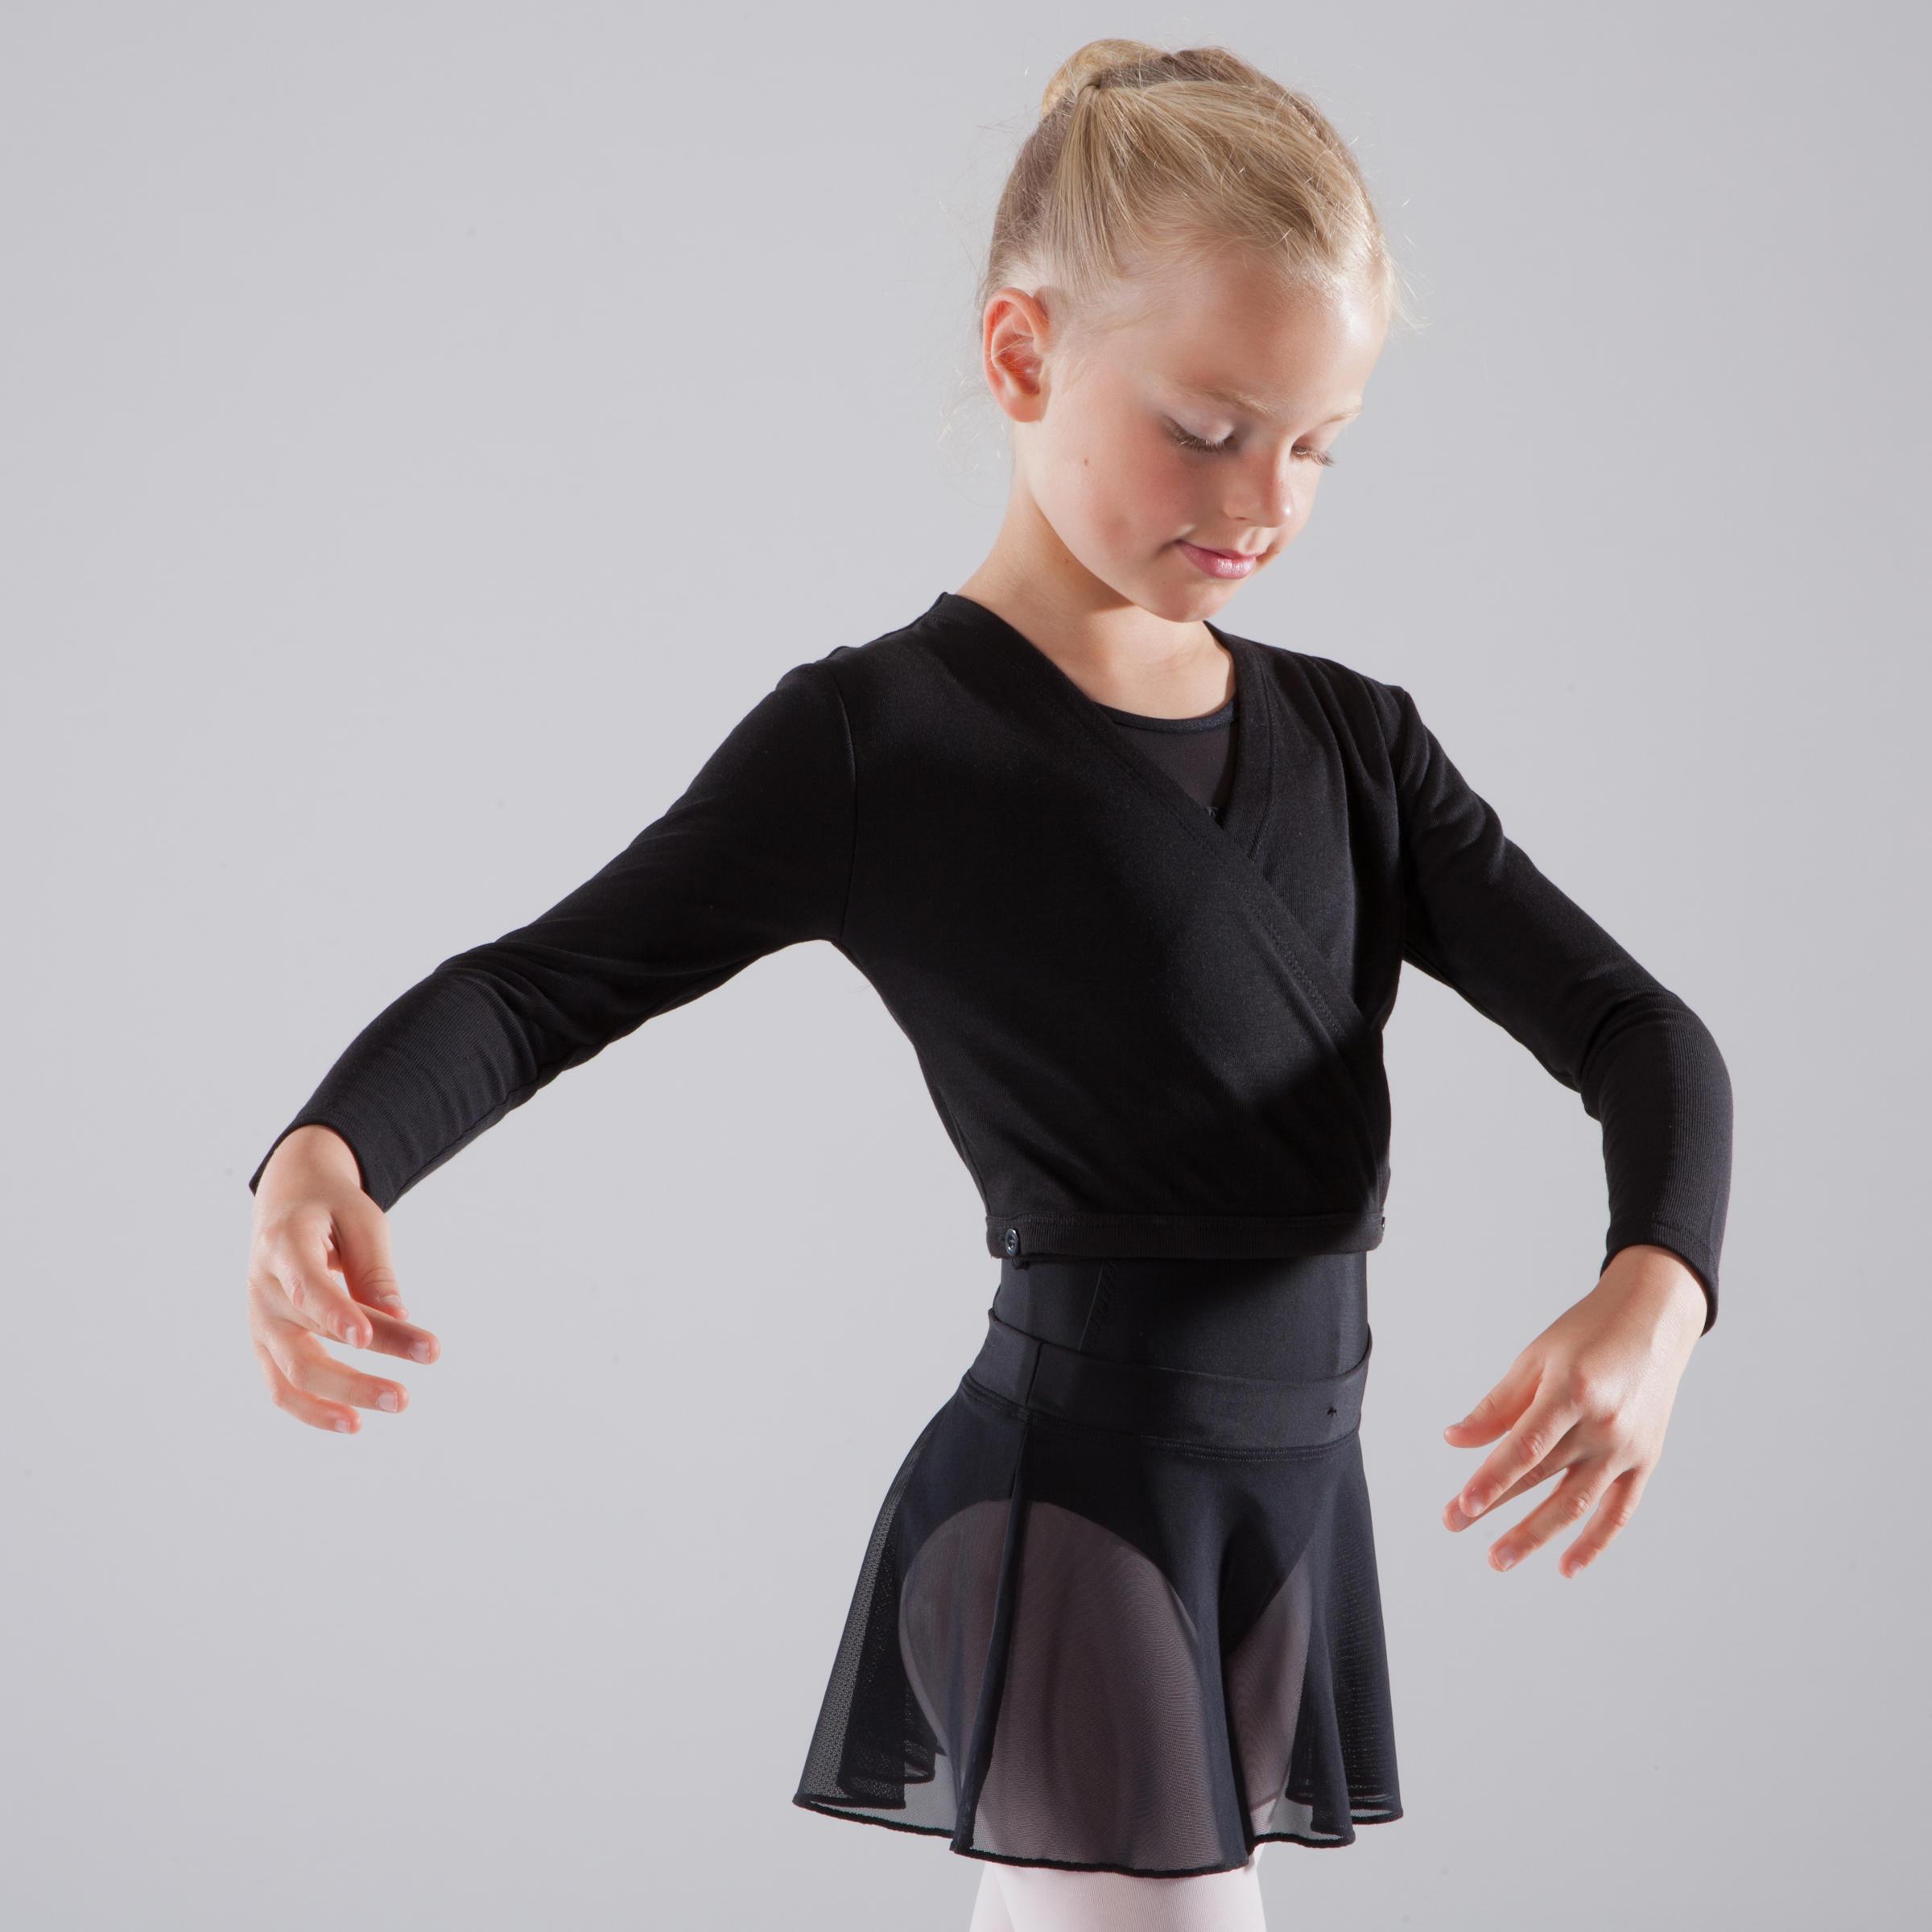 Girls' Ballet Wrap Top - Black